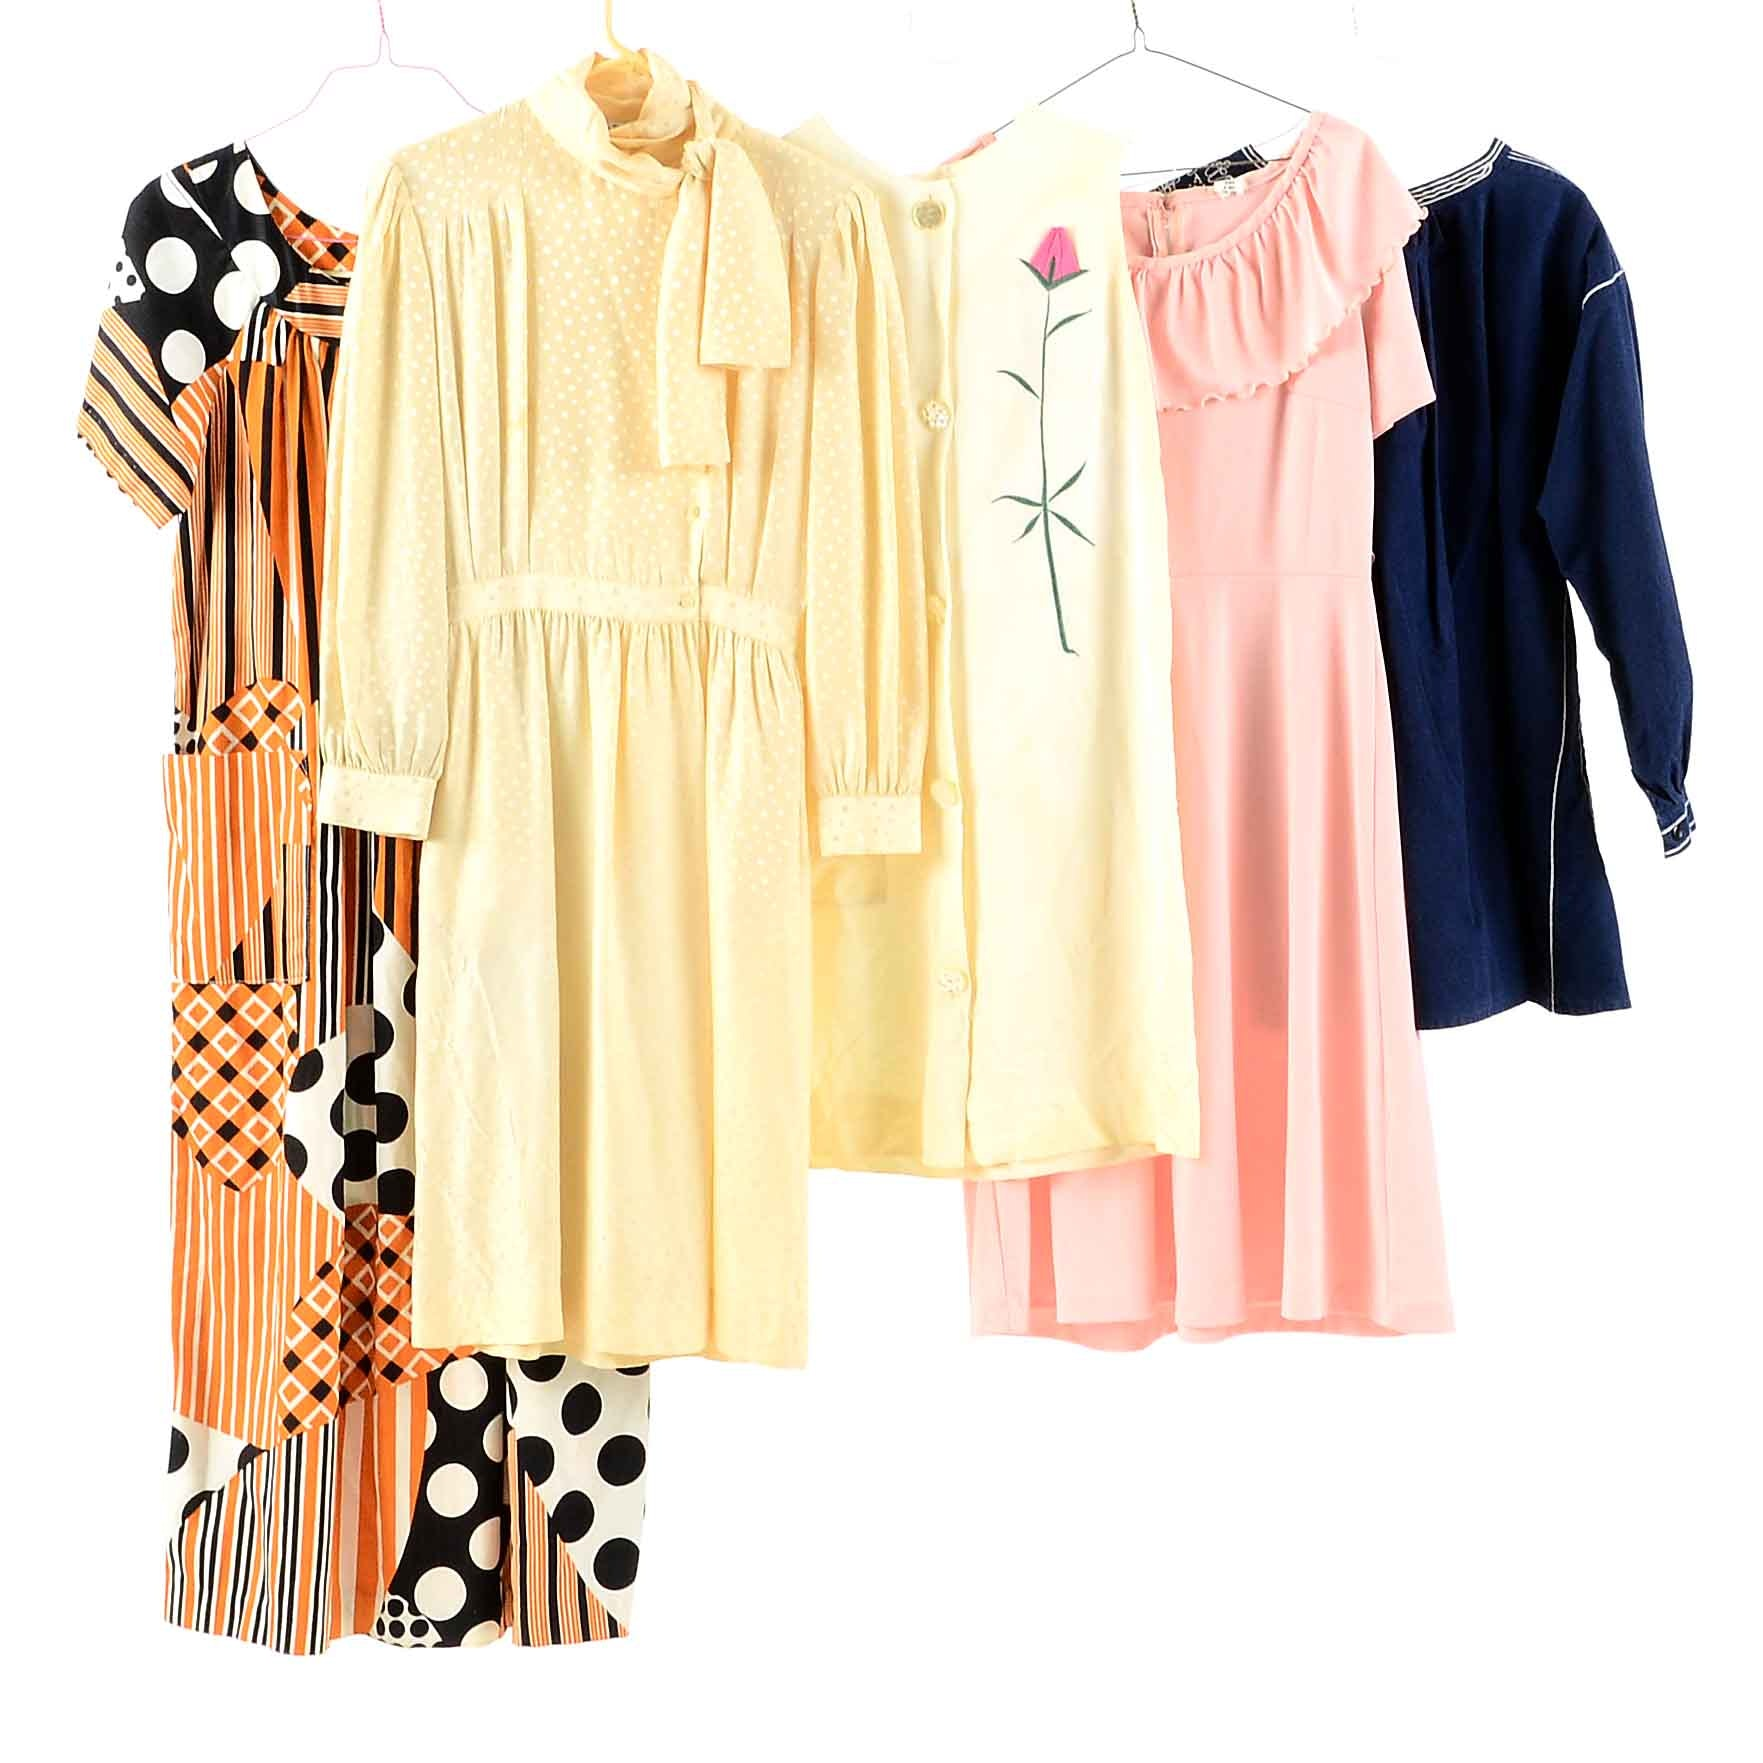 Women's Vintage Circa 1970s Dresses